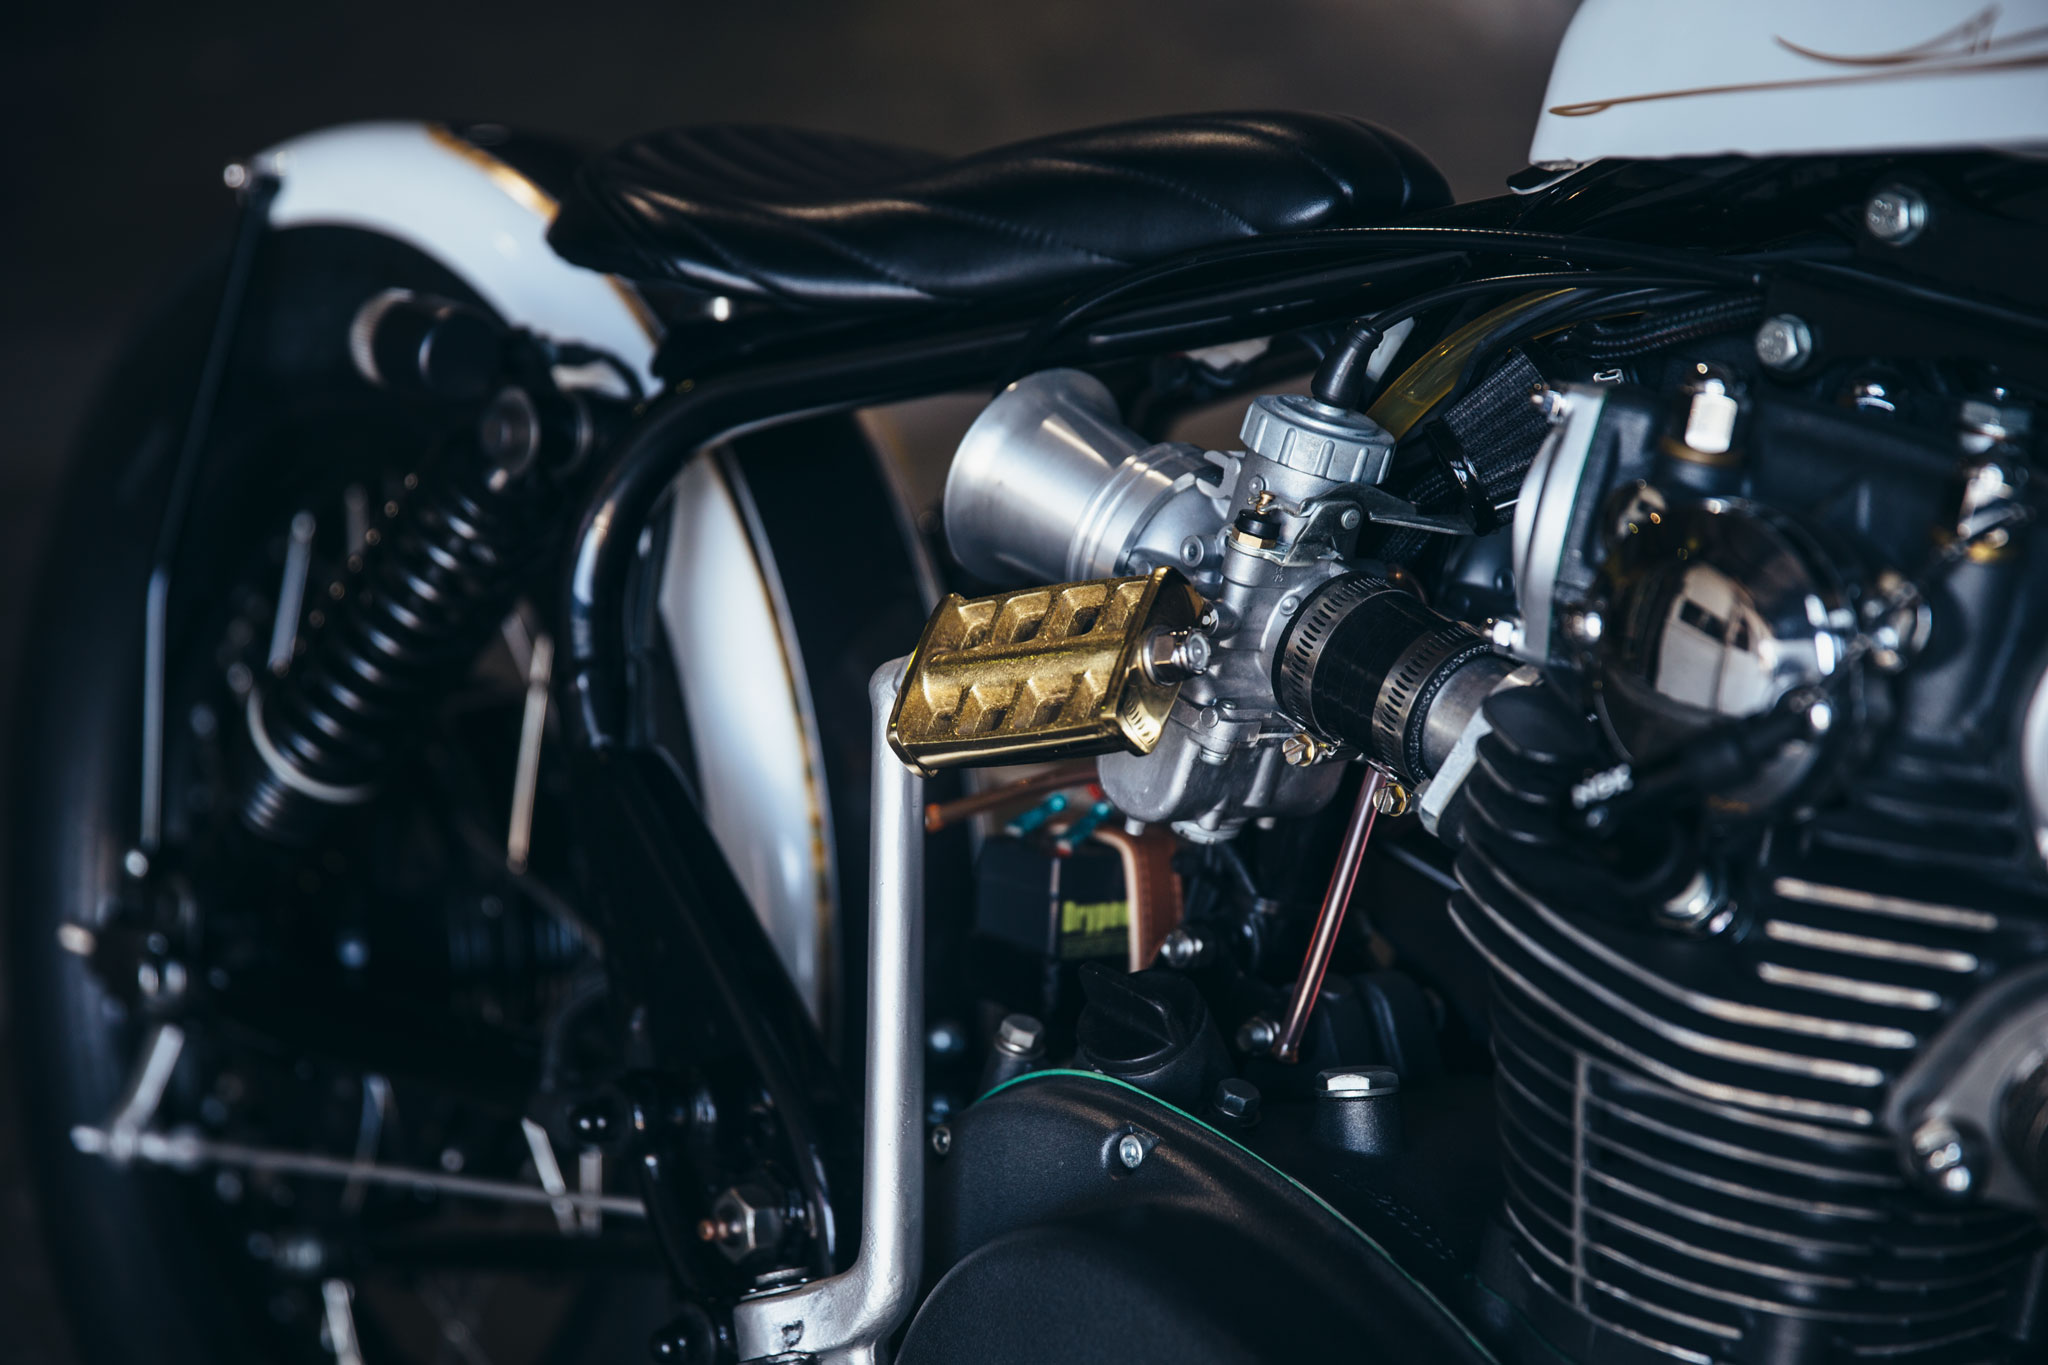 Xxie – Nick's '75 Yamaha XS650 | Throttle Roll